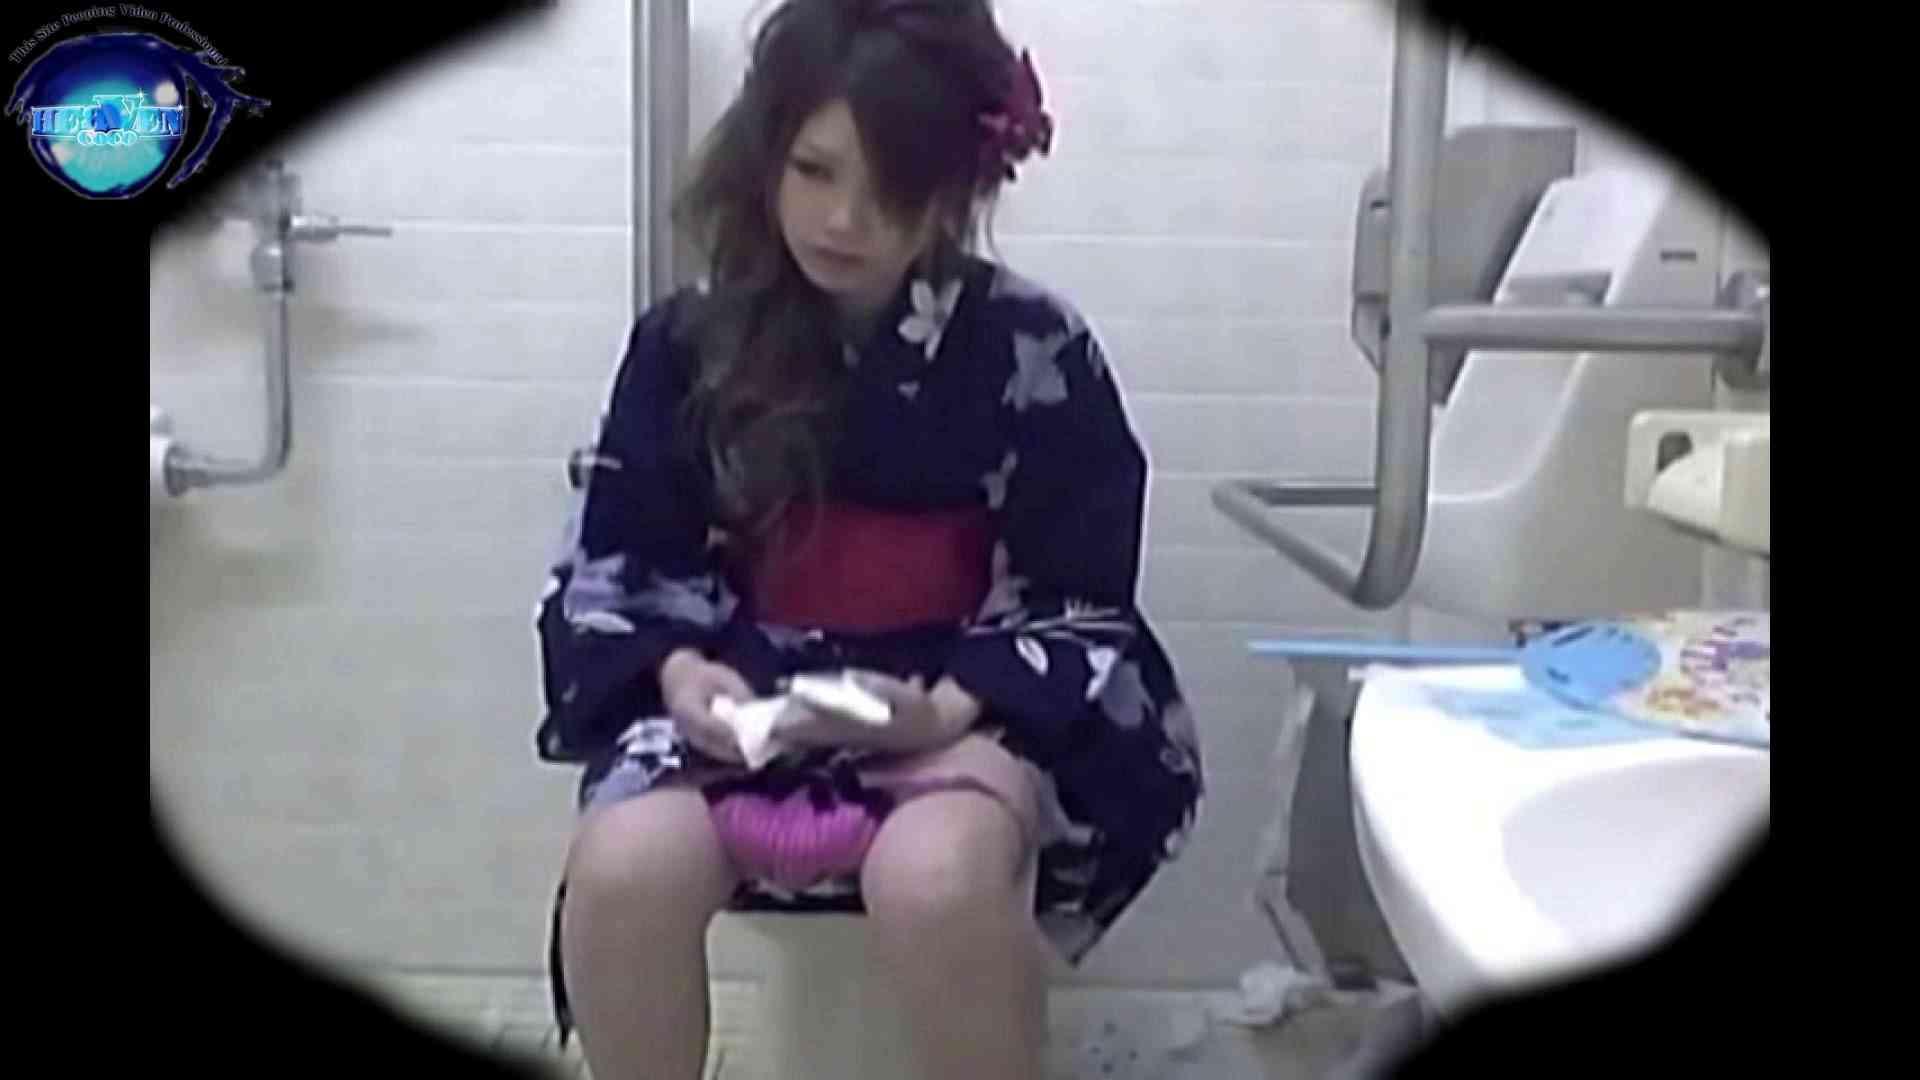 teen galトイレ覗き紙がナイ編‼vol.17 トイレ流出 | 覗き  93連発 81